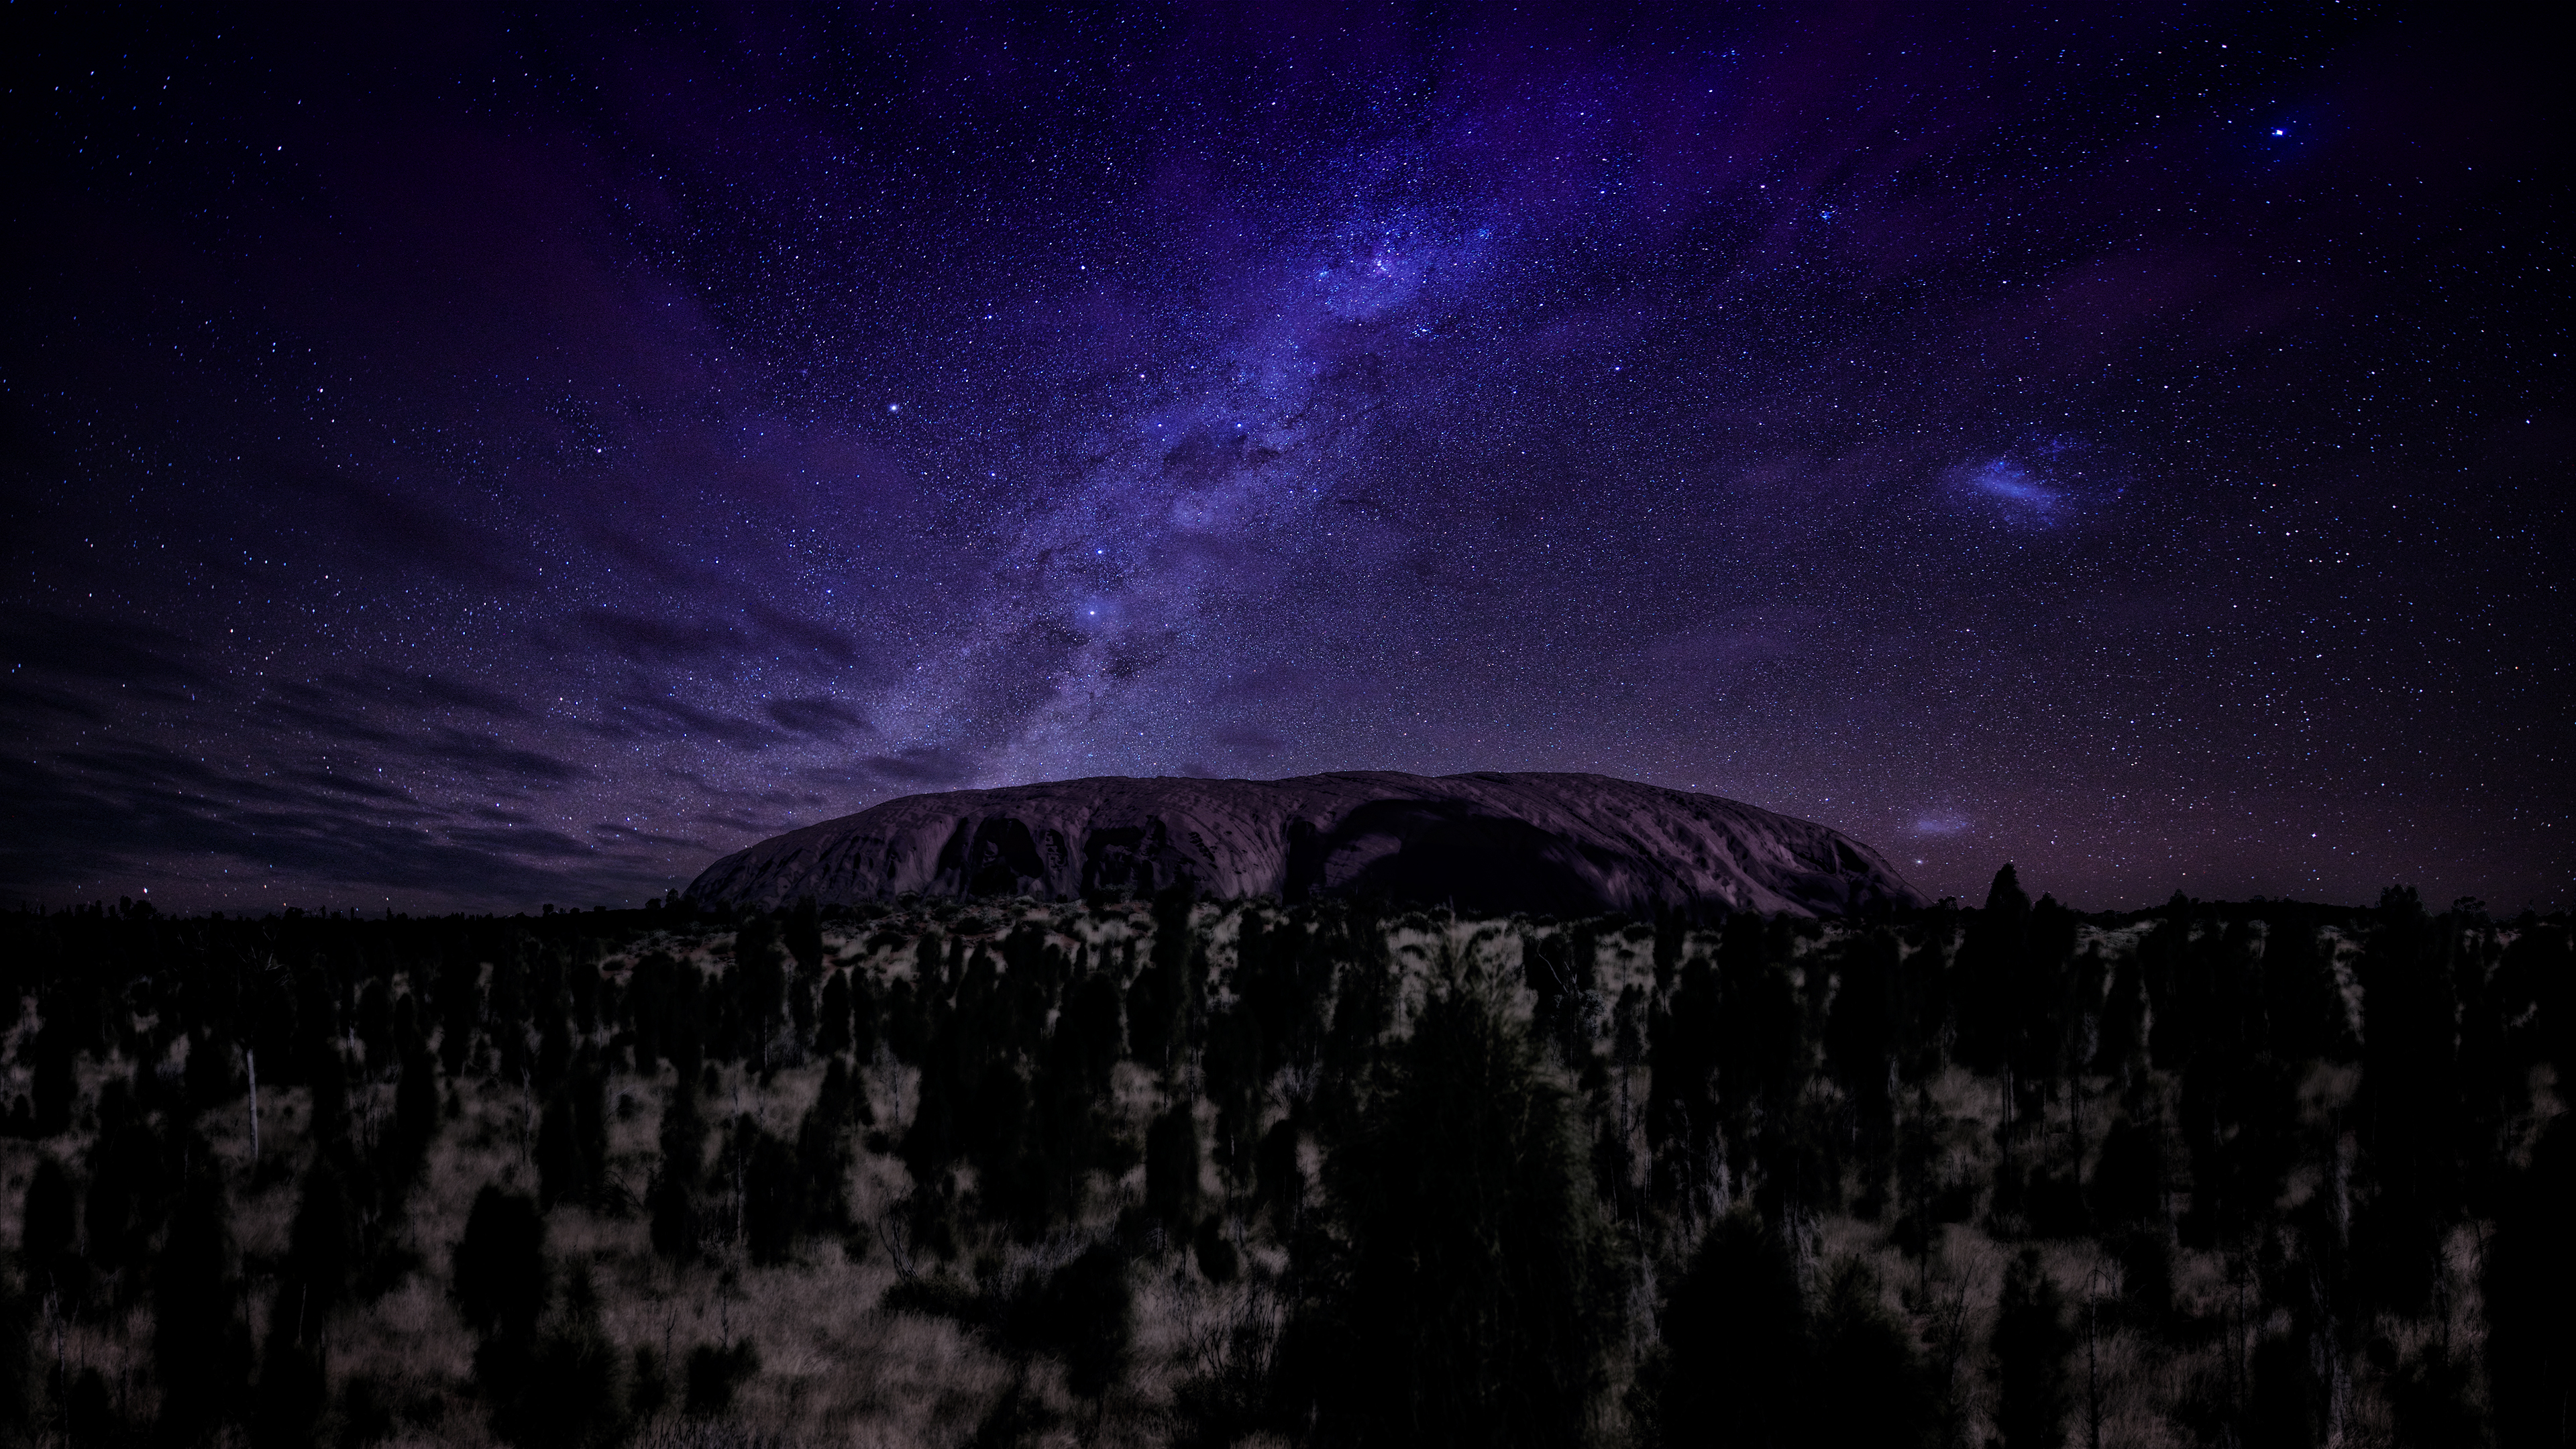 Milky Way Dark Night 4k, HD Nature, 4k Wallpapers, Images ...